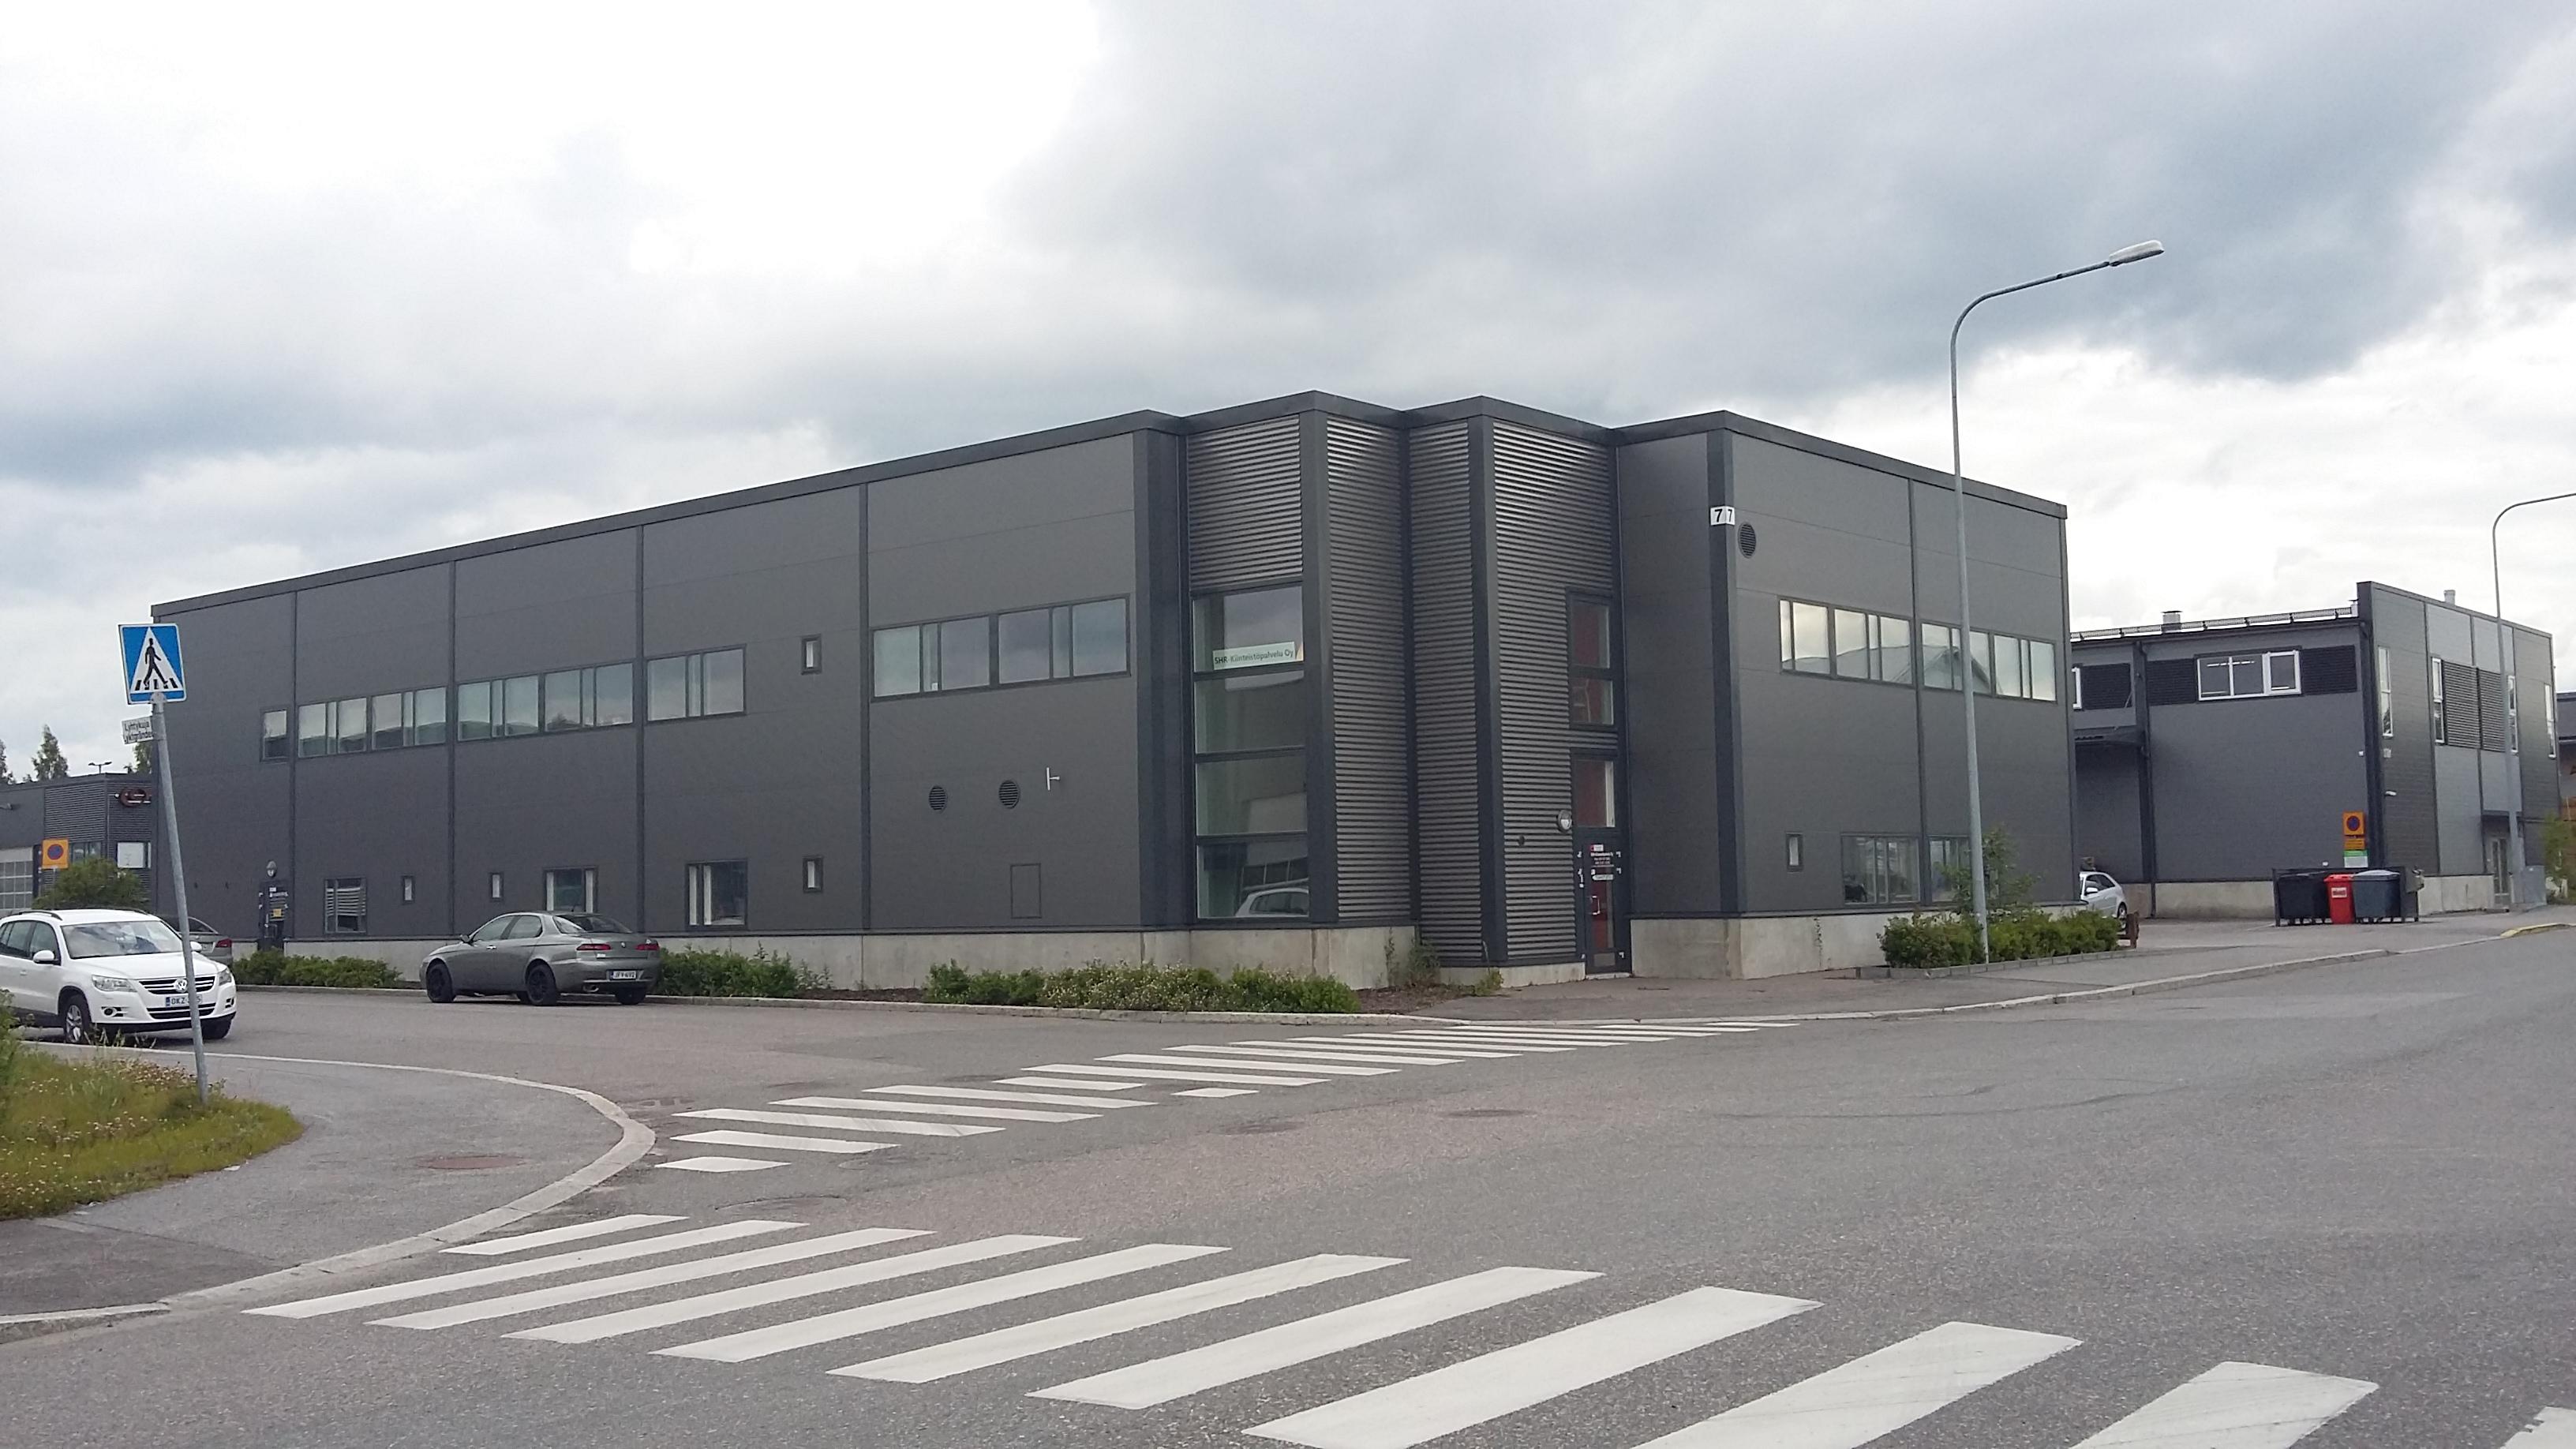 Lyhtytie 7, Suutarila, Tapulikaupunki, Helsinki